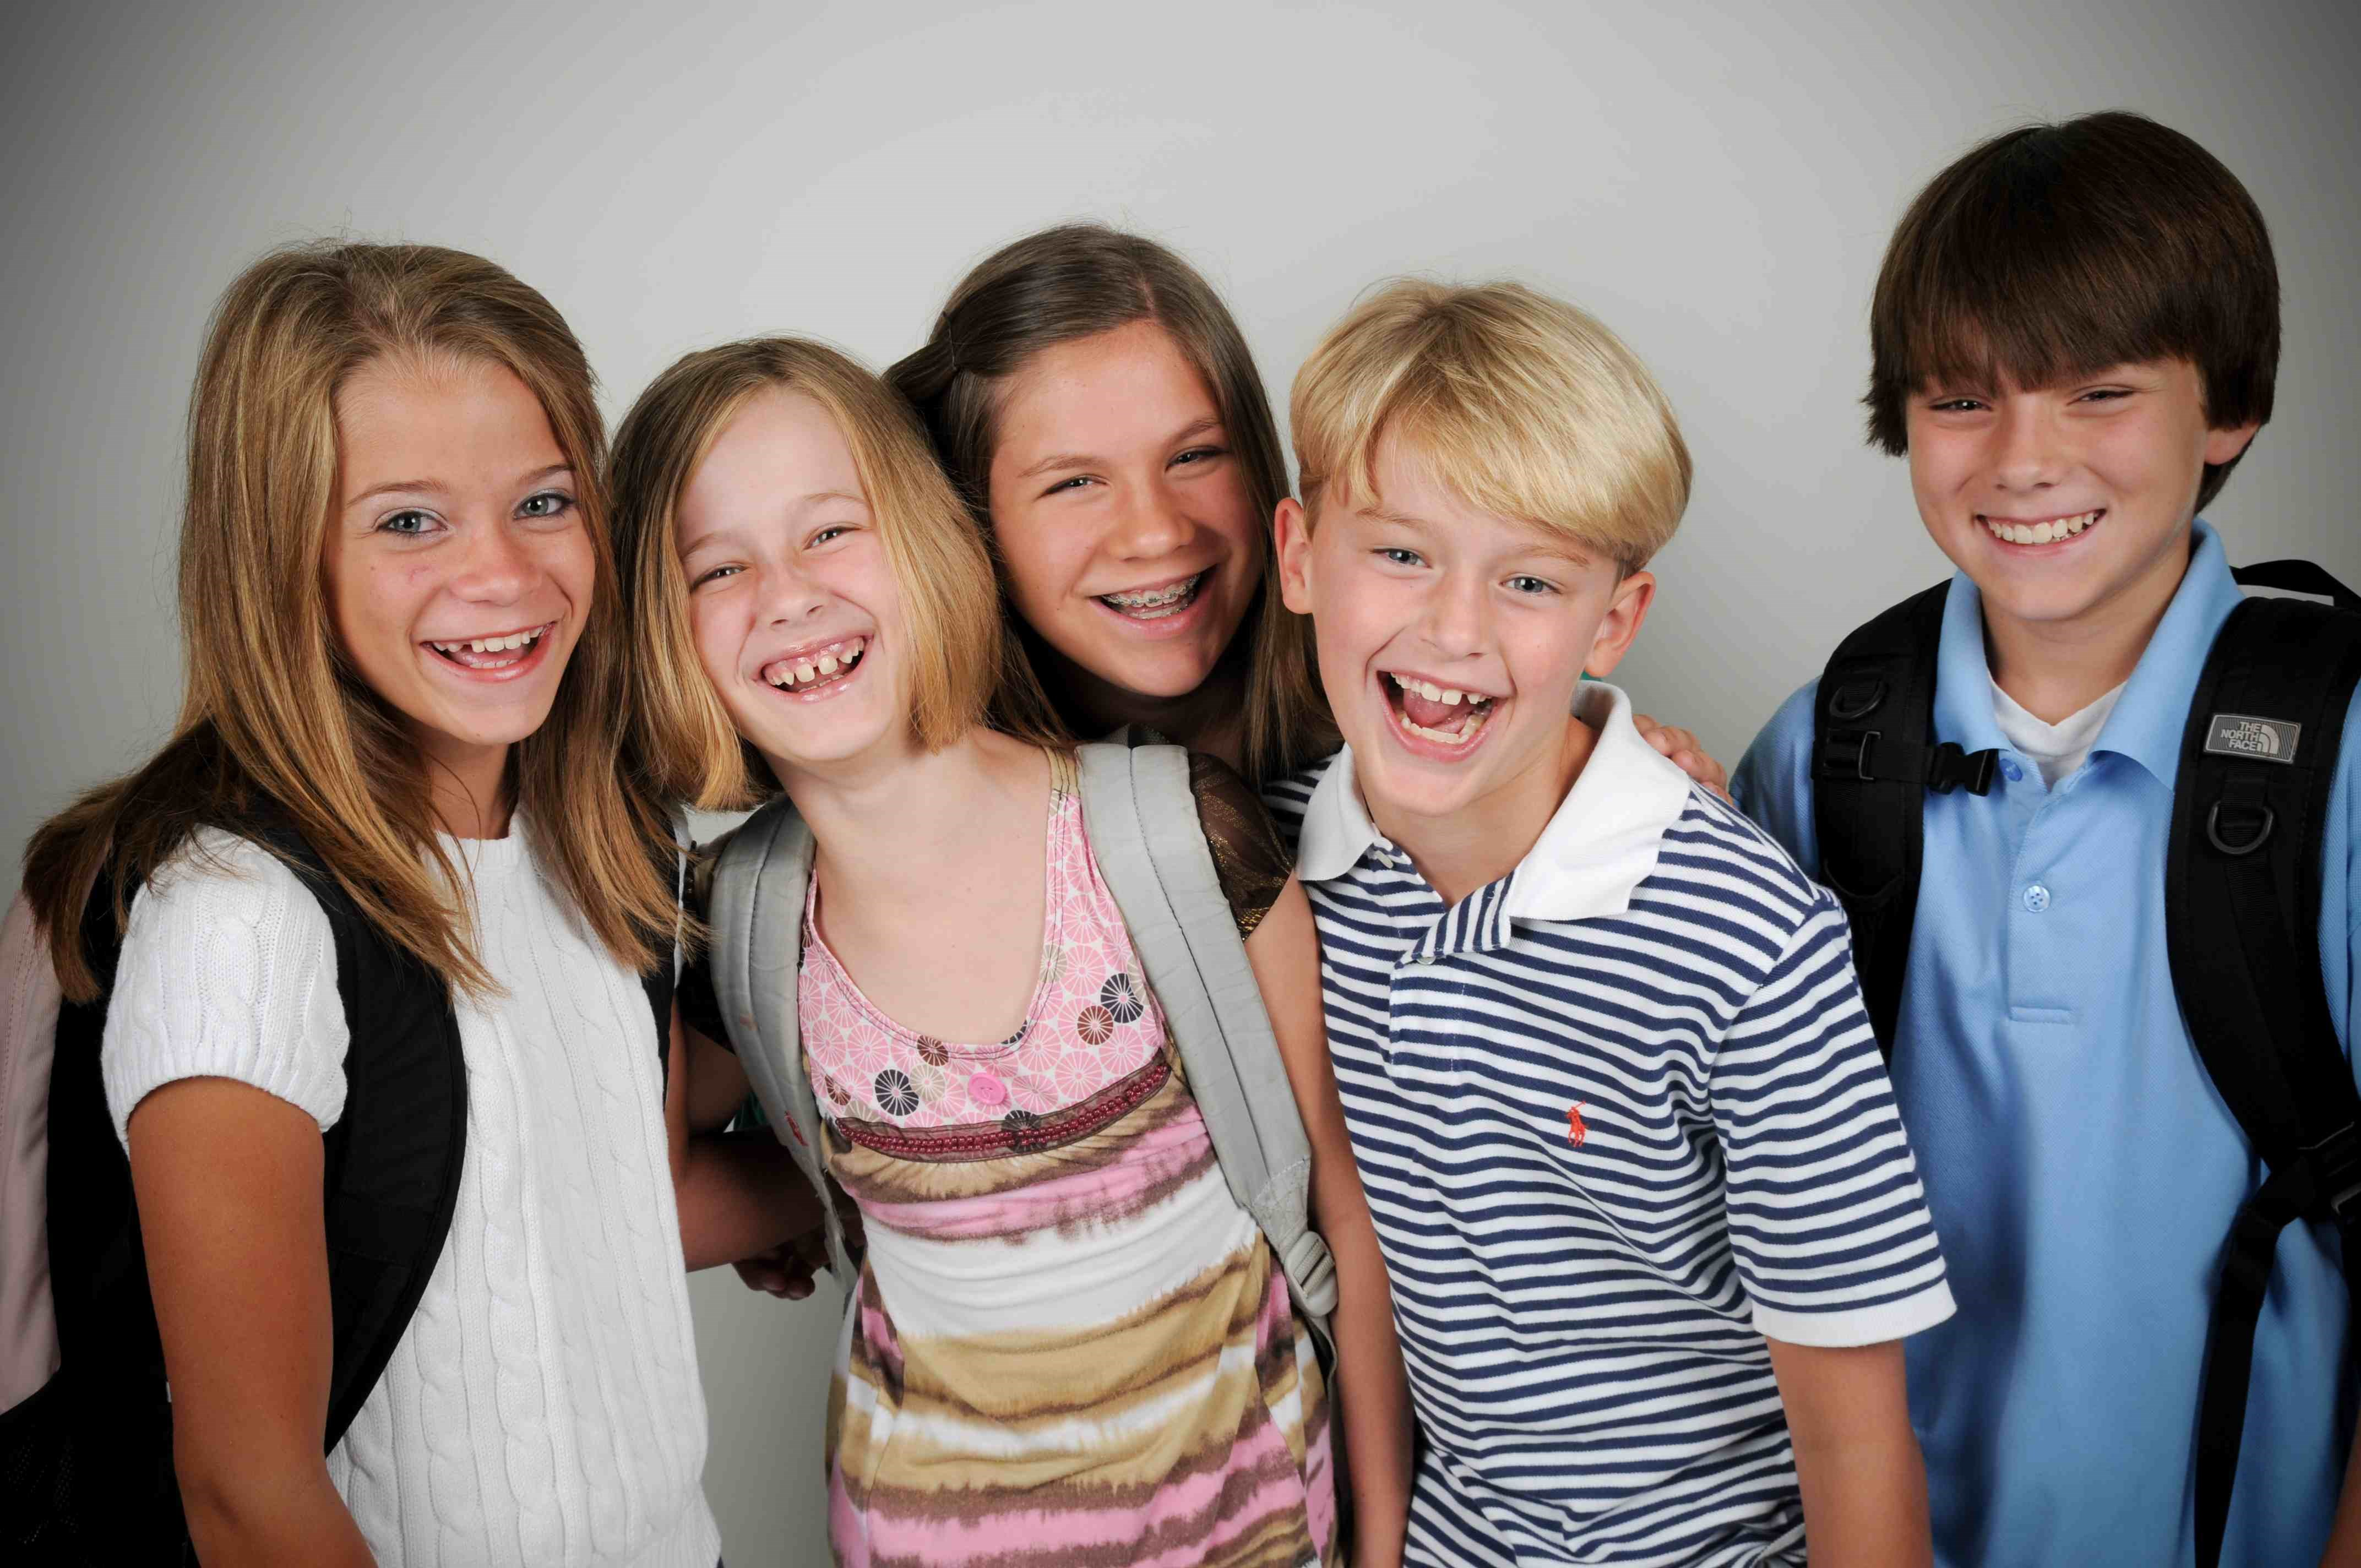 Humping group teens